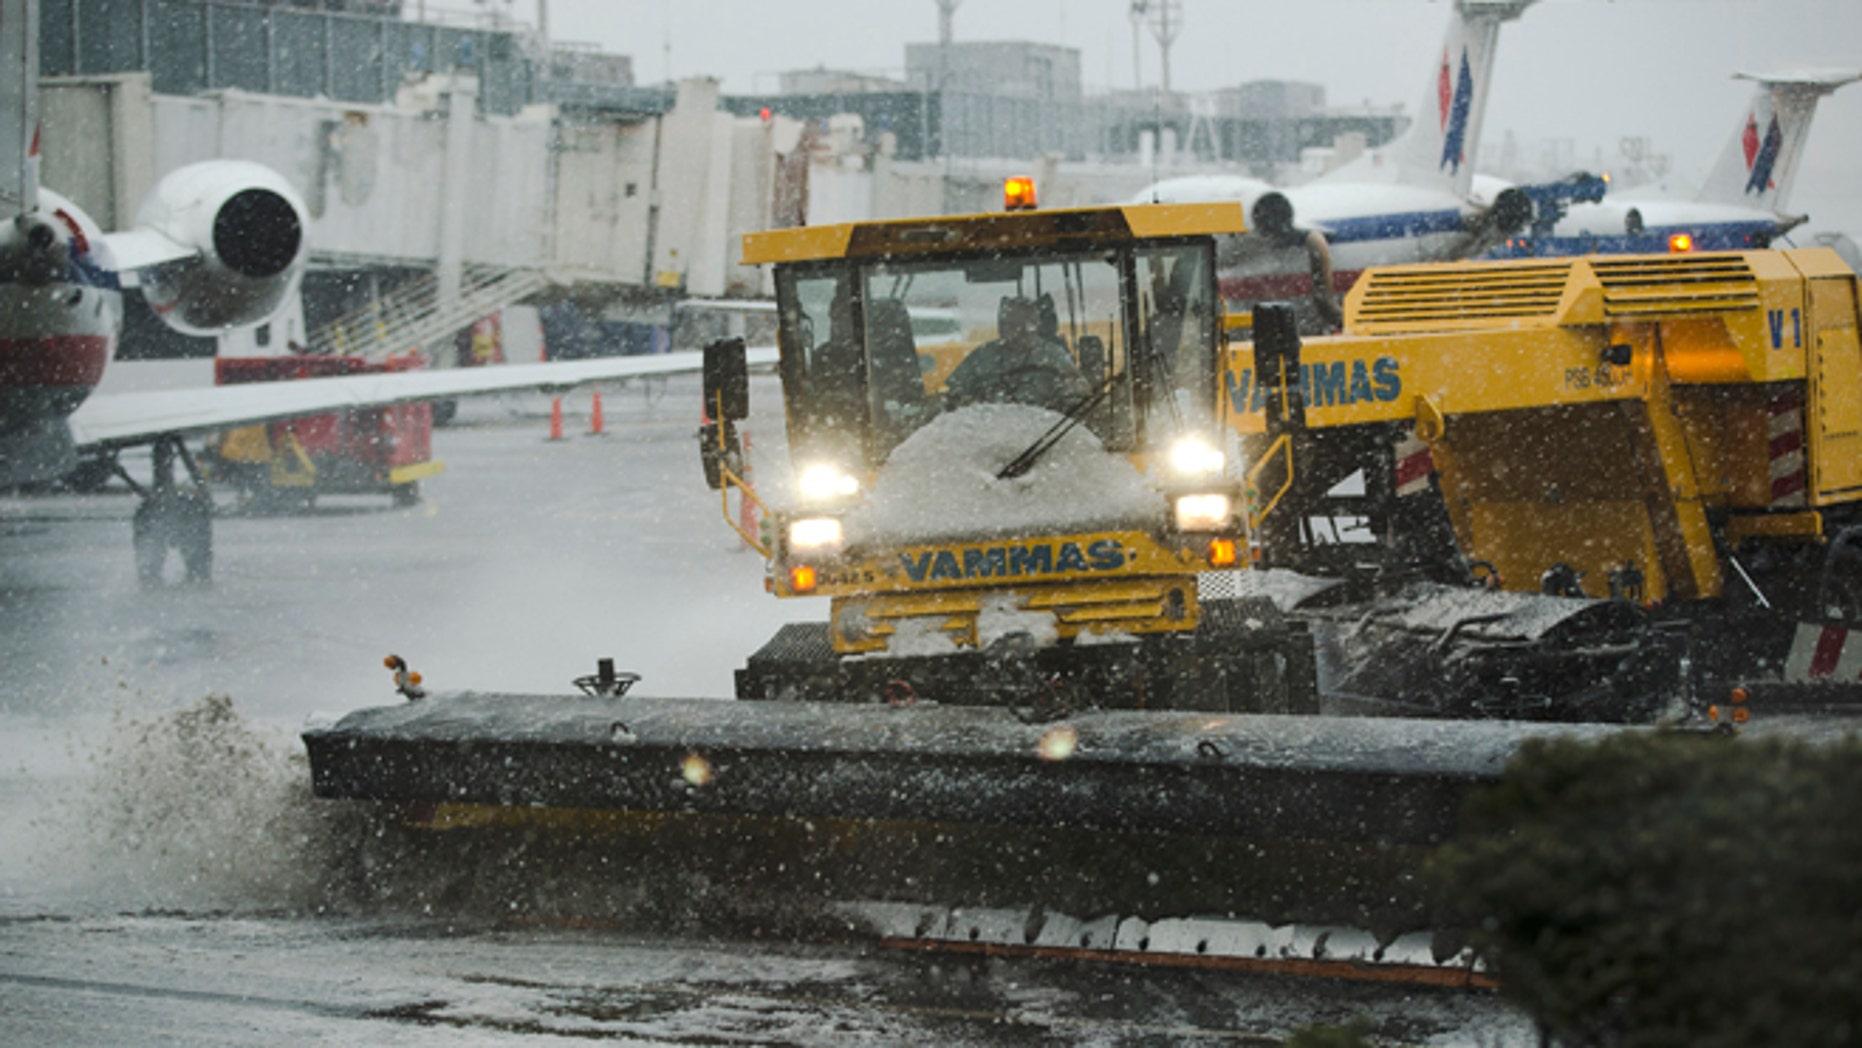 Feb. 8: Grounds crews clear the tarmac at LaGuardia Airport in New York.